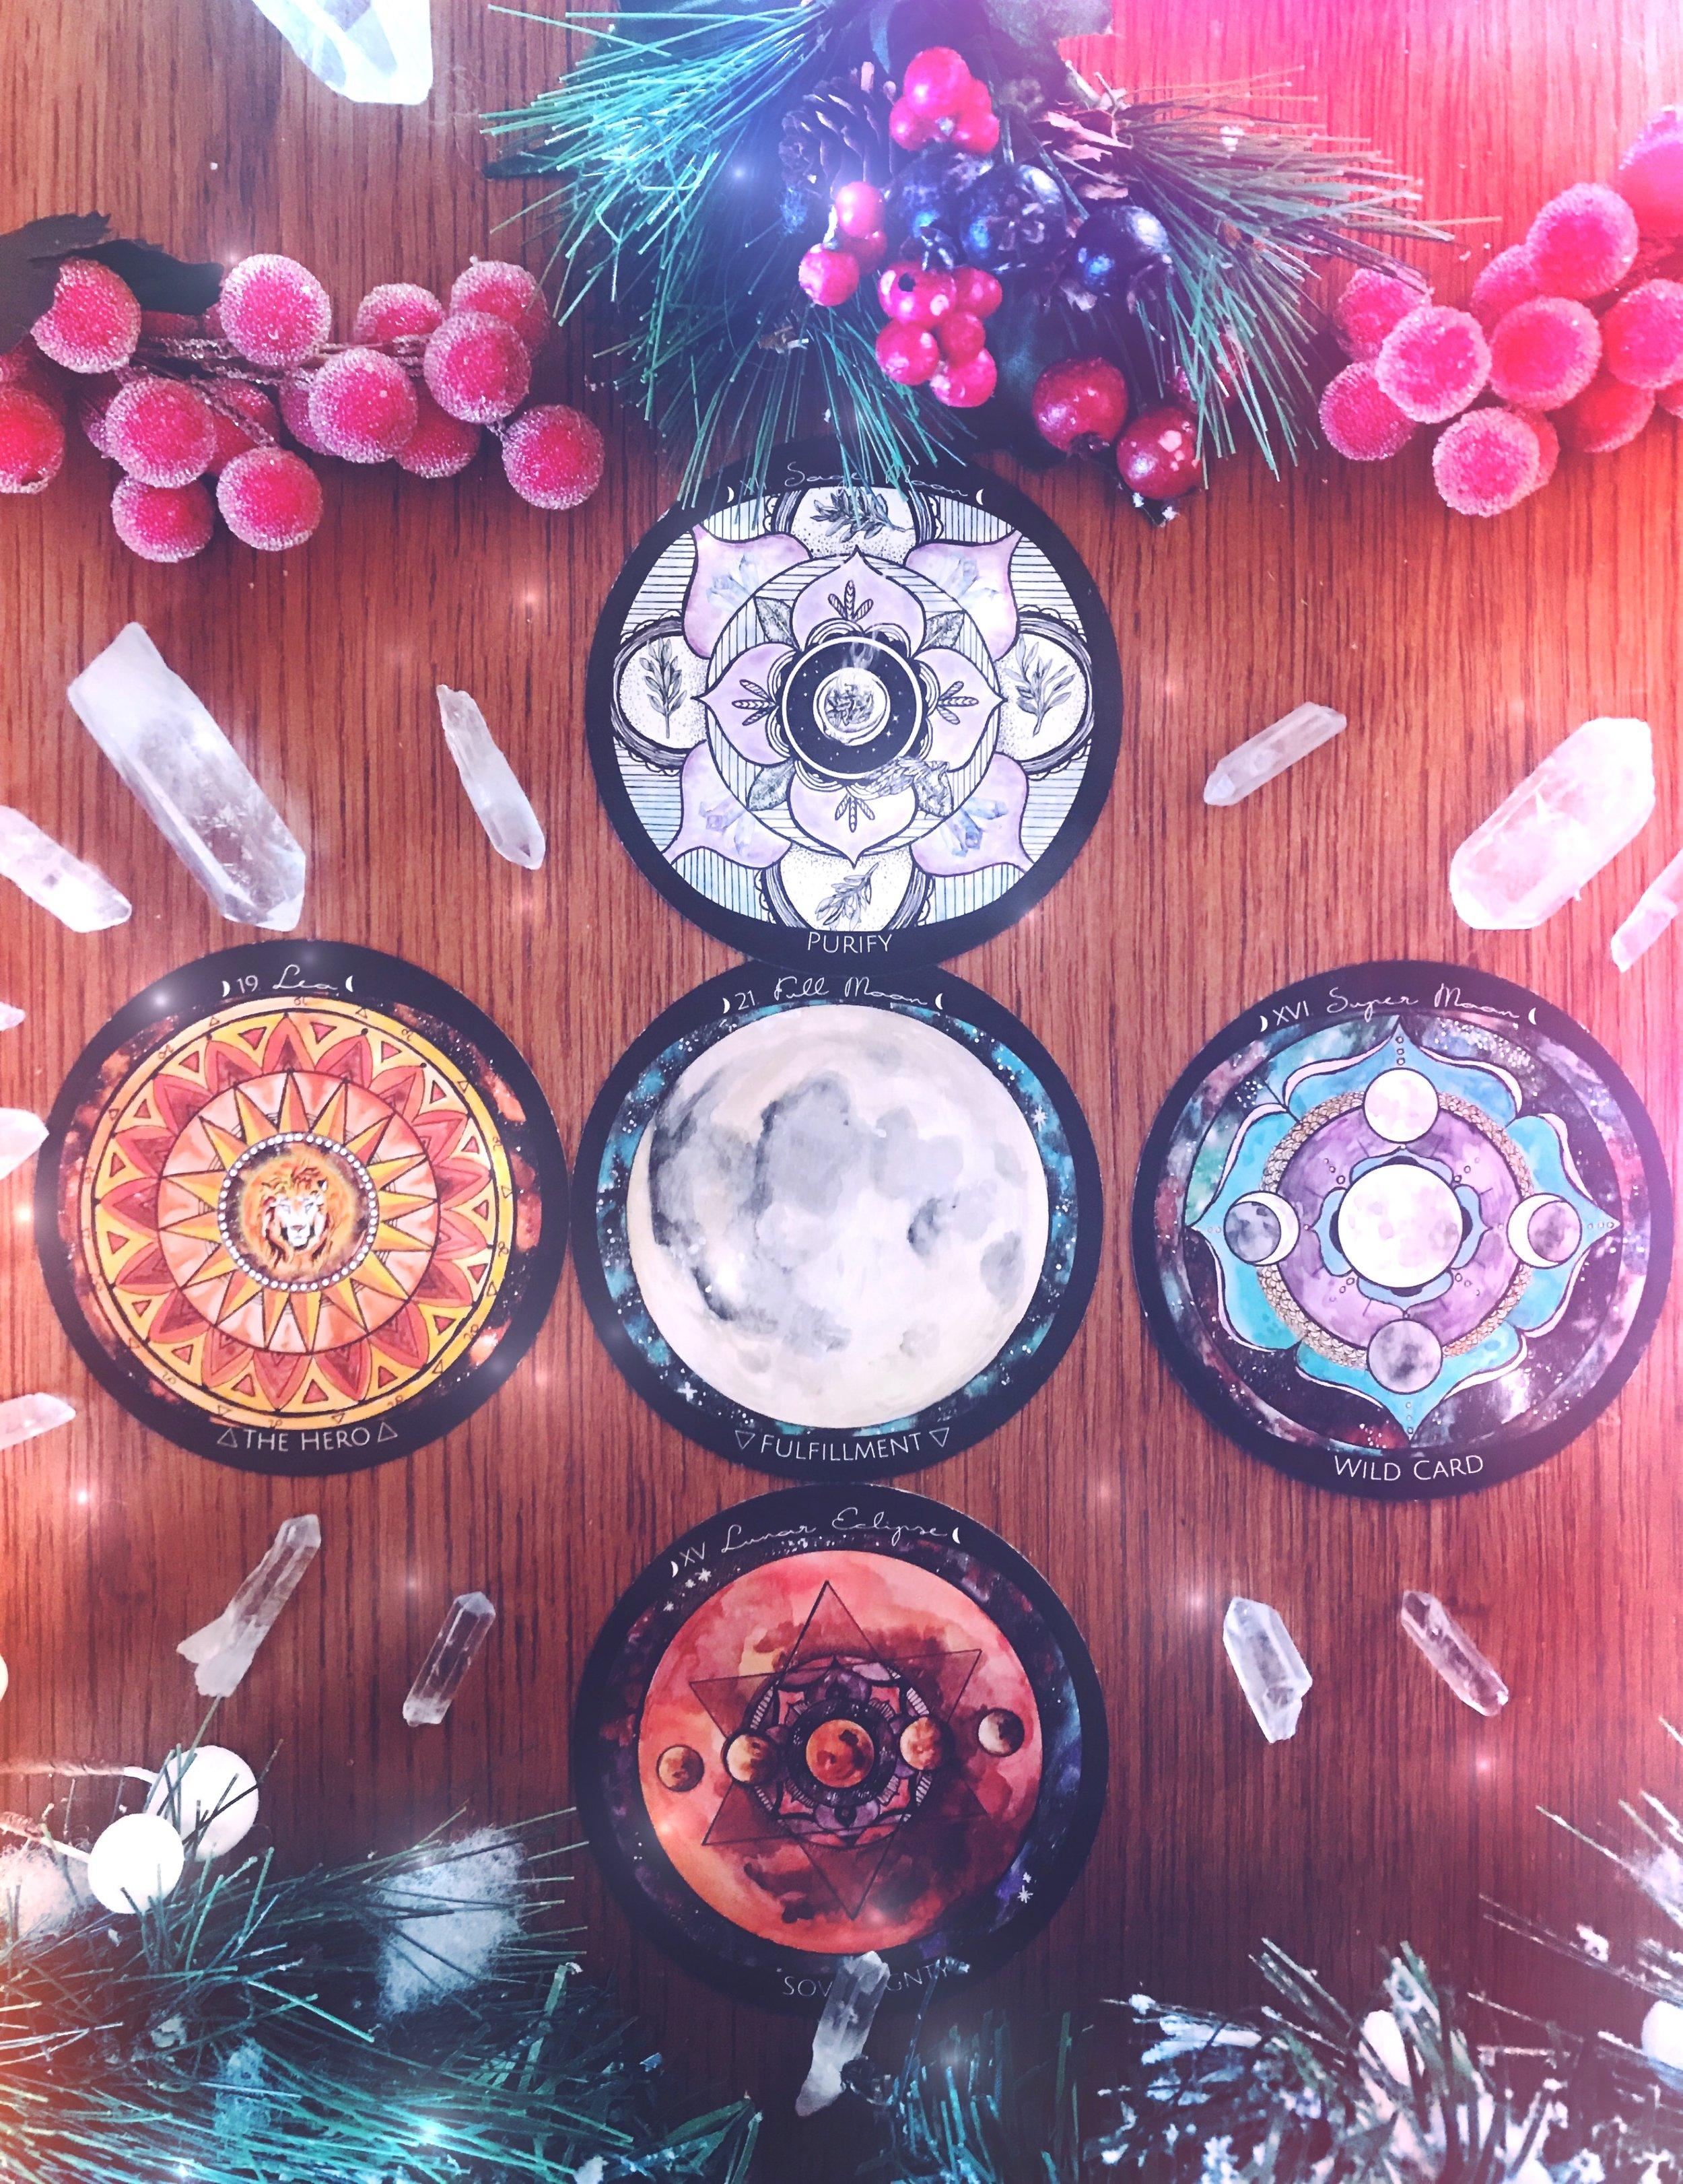 2019 New Moon in Capricorn energy report